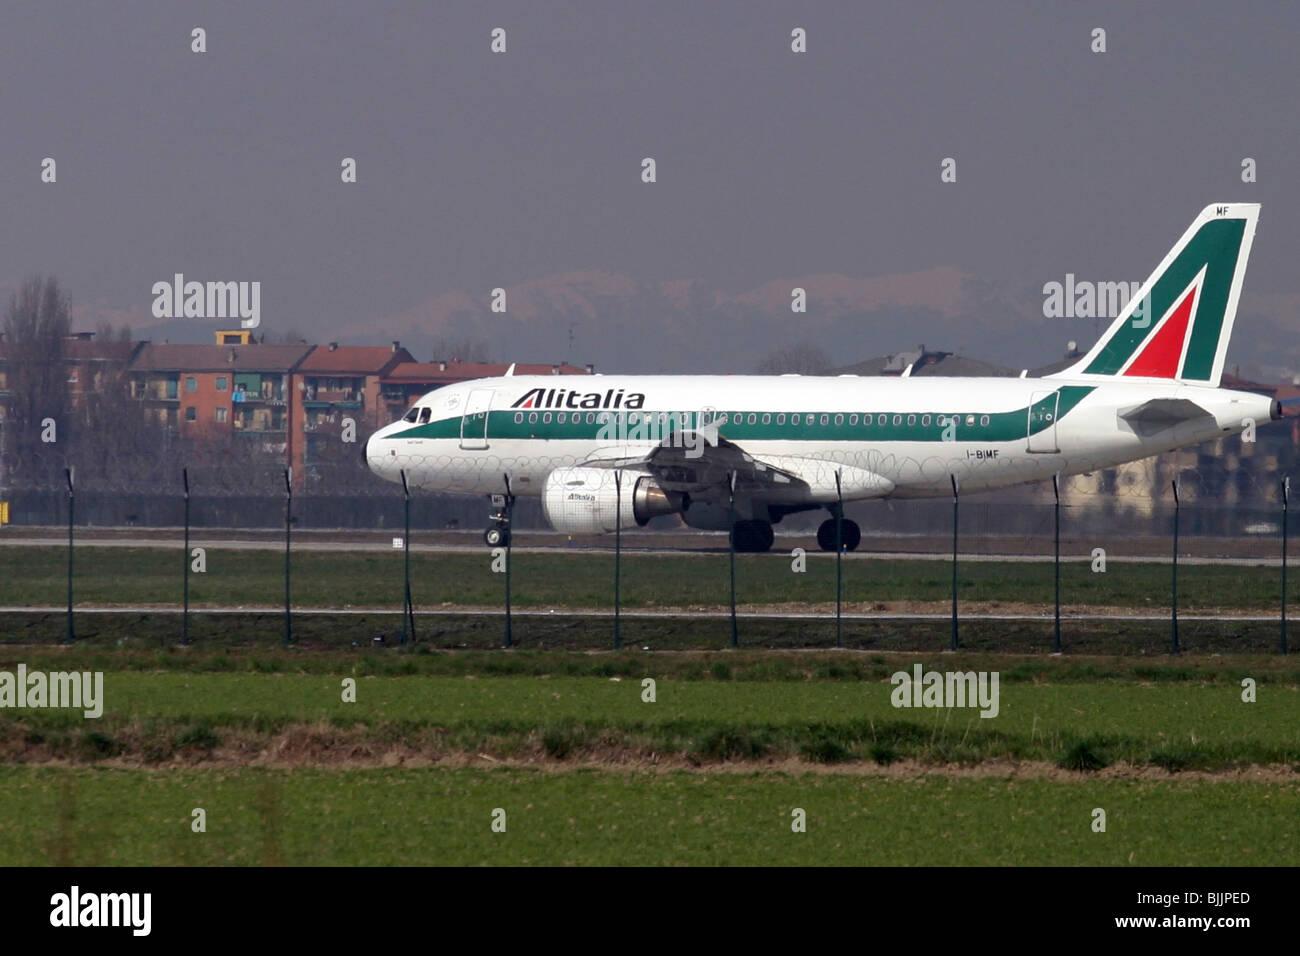 Italy, Milan, Linate Airport, Alitalia passenger jet at takeoff - Stock Image